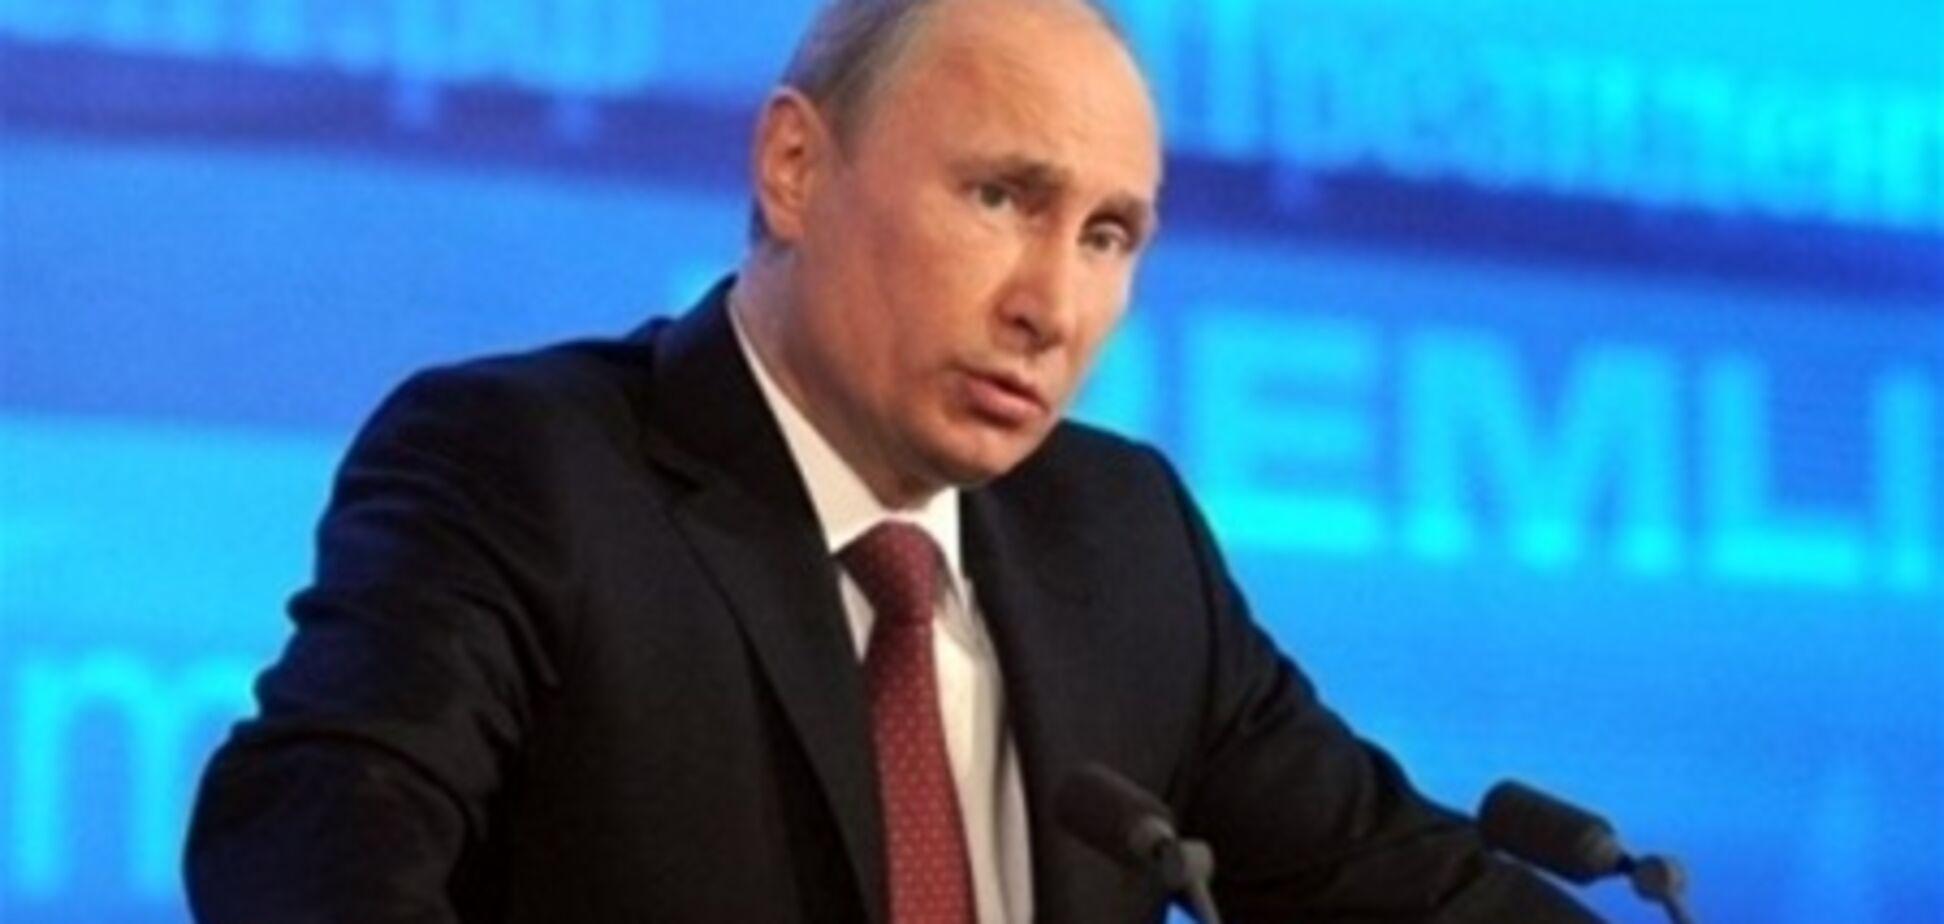 Путин и кольцо: американцы свели все на шутку